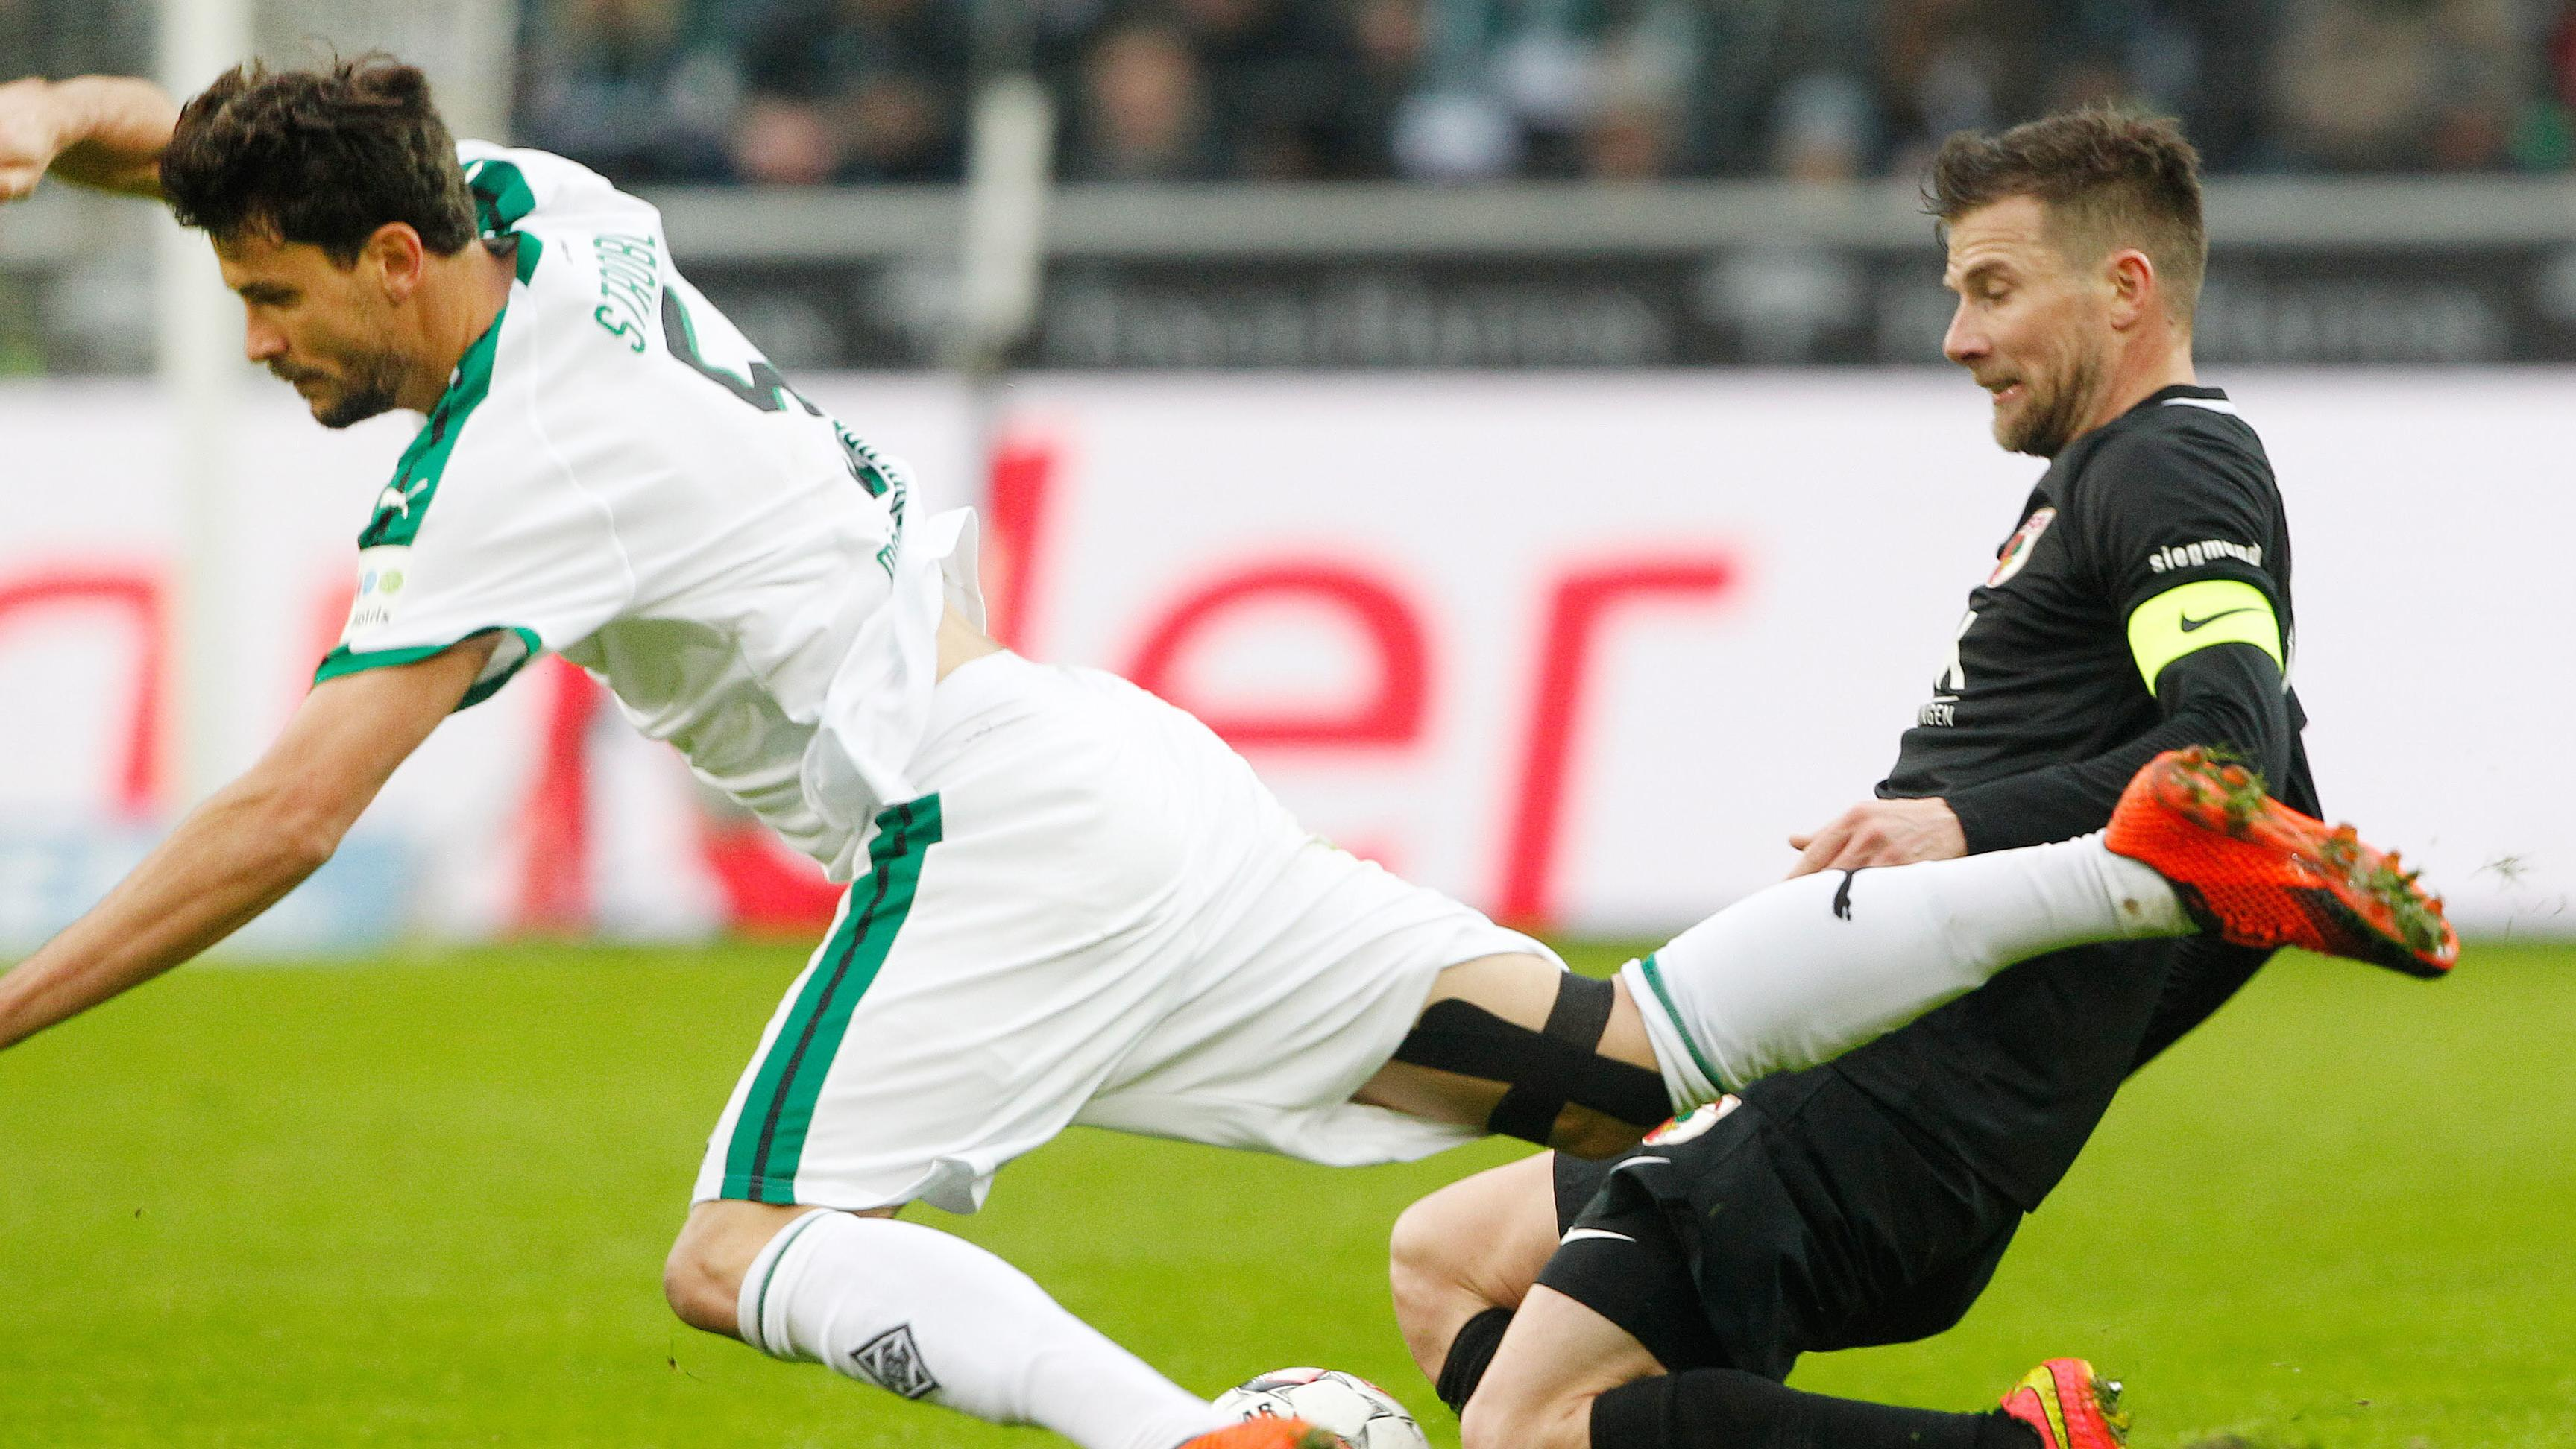 Spielszene Borussia Mönchengladbach - FC Augsburg